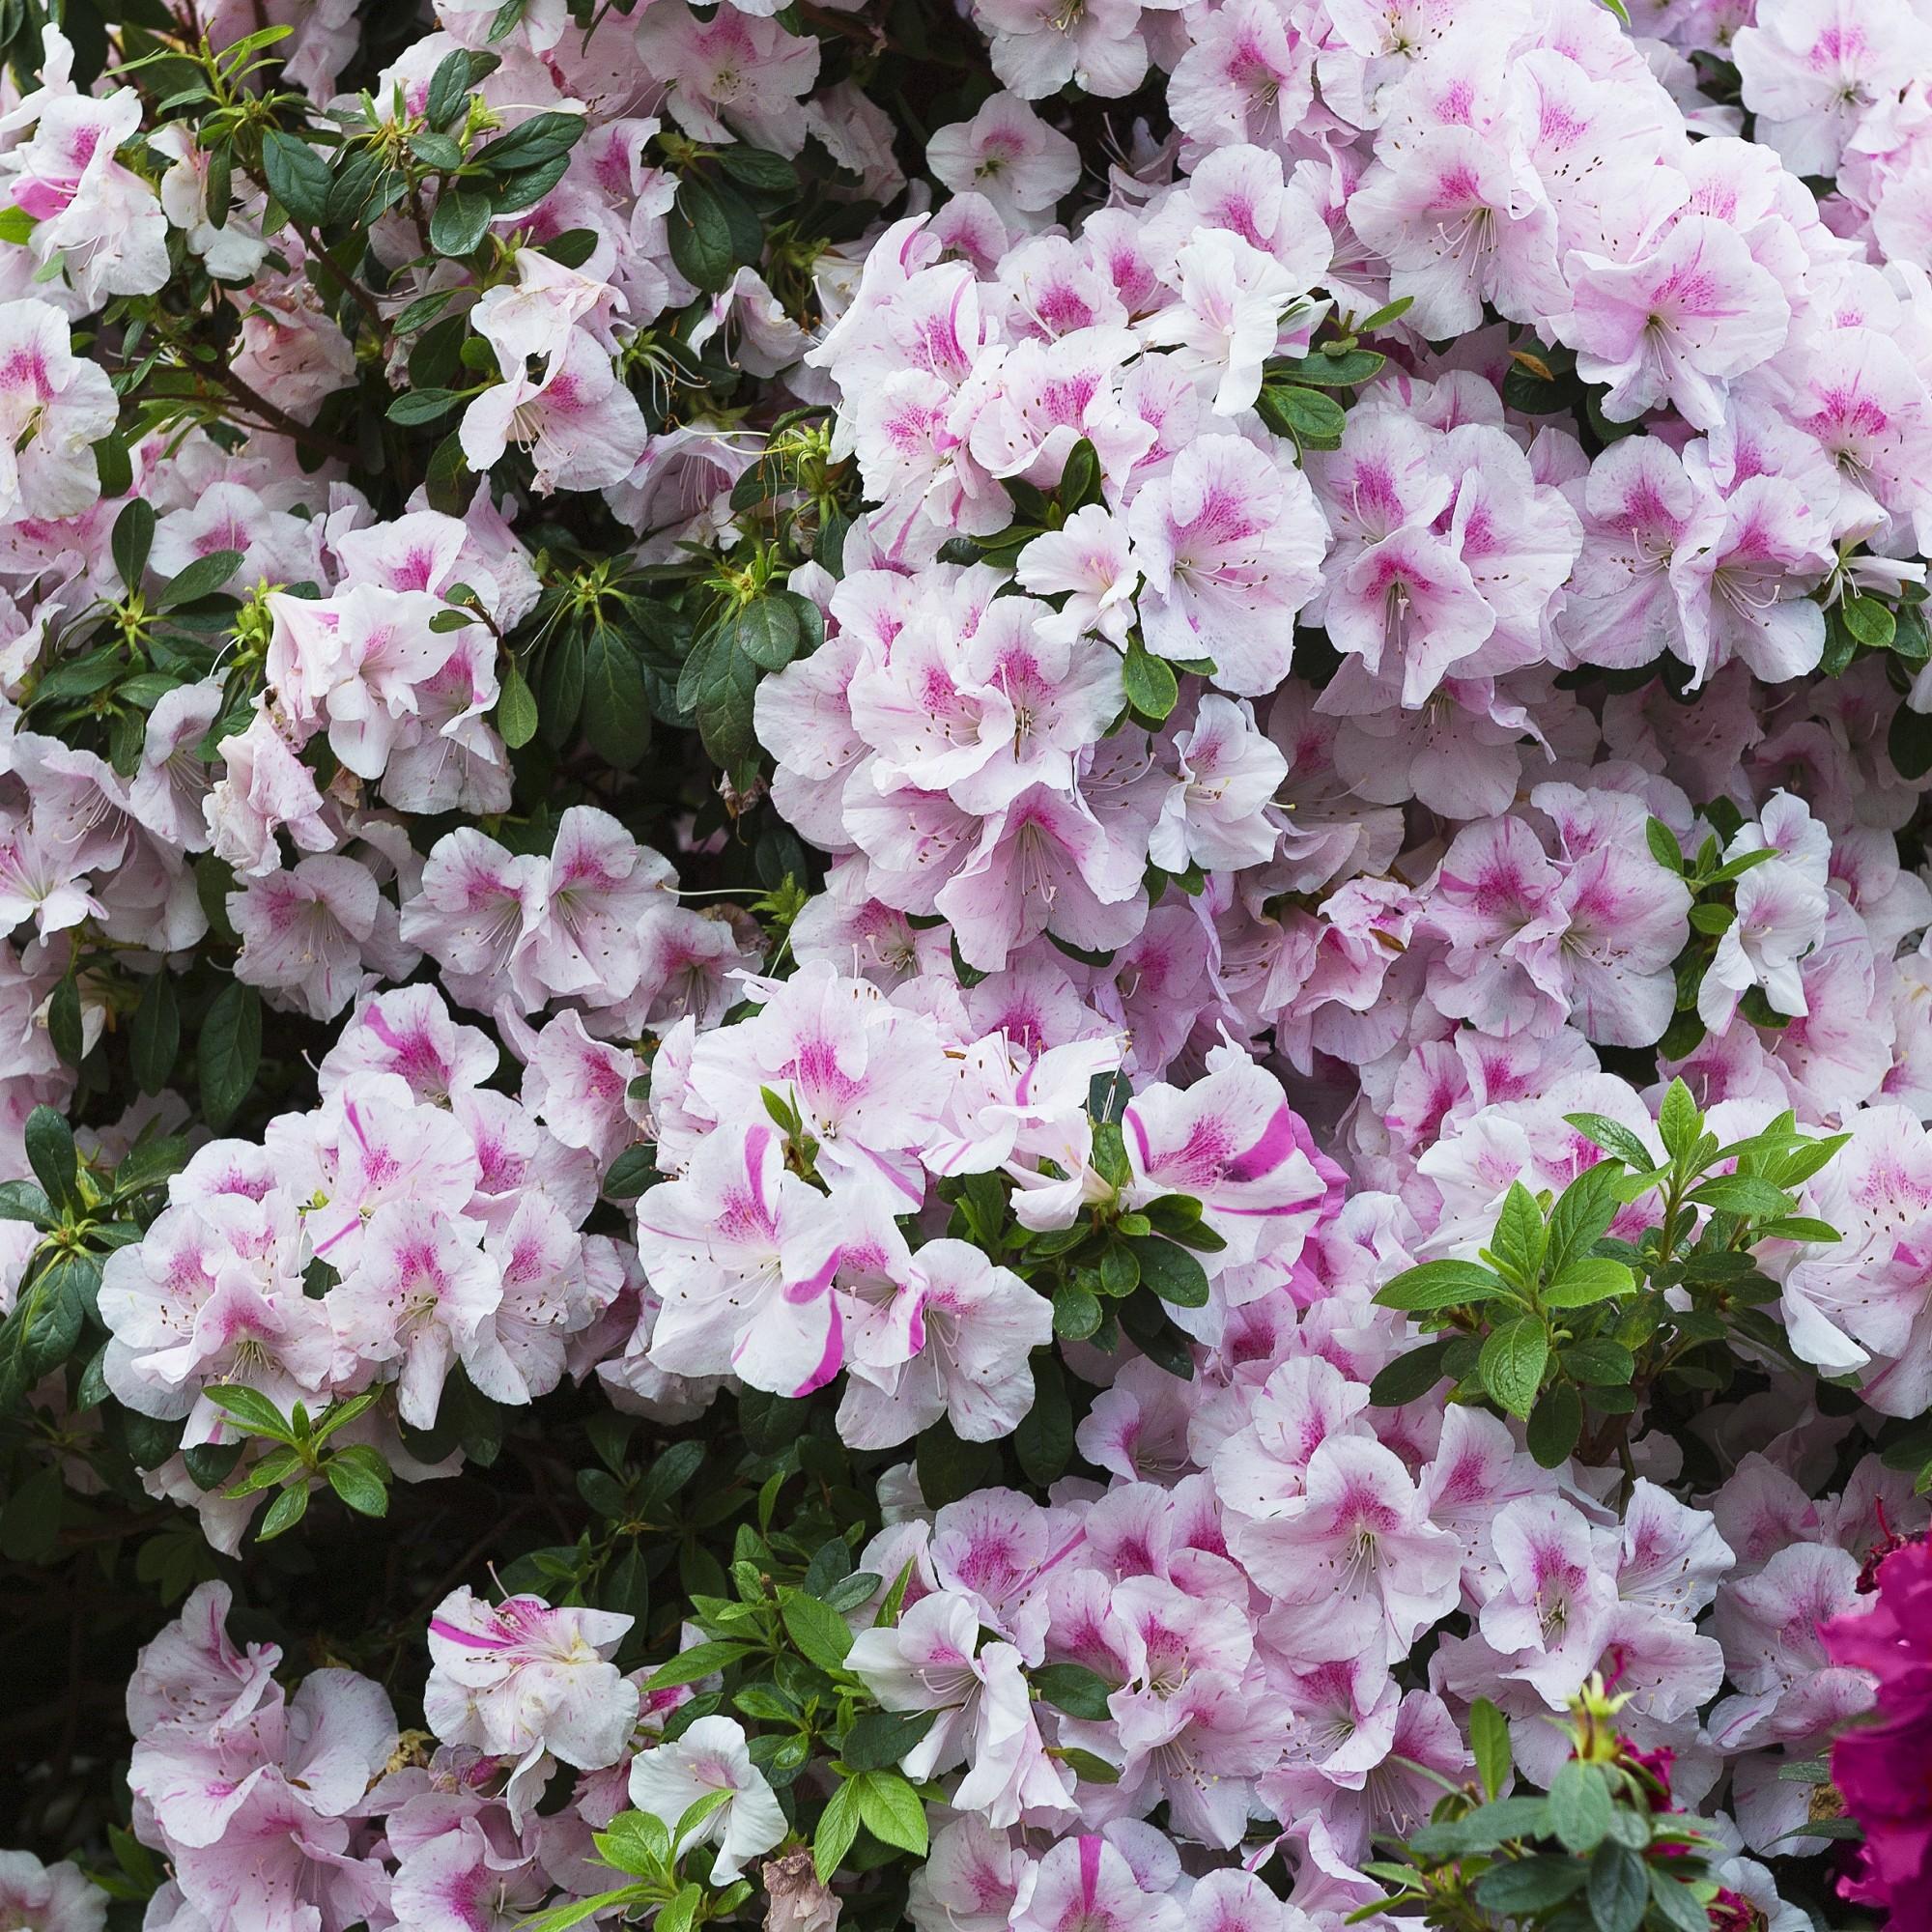 Encore Azalea Autumn 'Twist' 3gal U.S.D.A. Hardiness Zones 6-10 - 1pc - Cottage Hill, Green/White/Purple